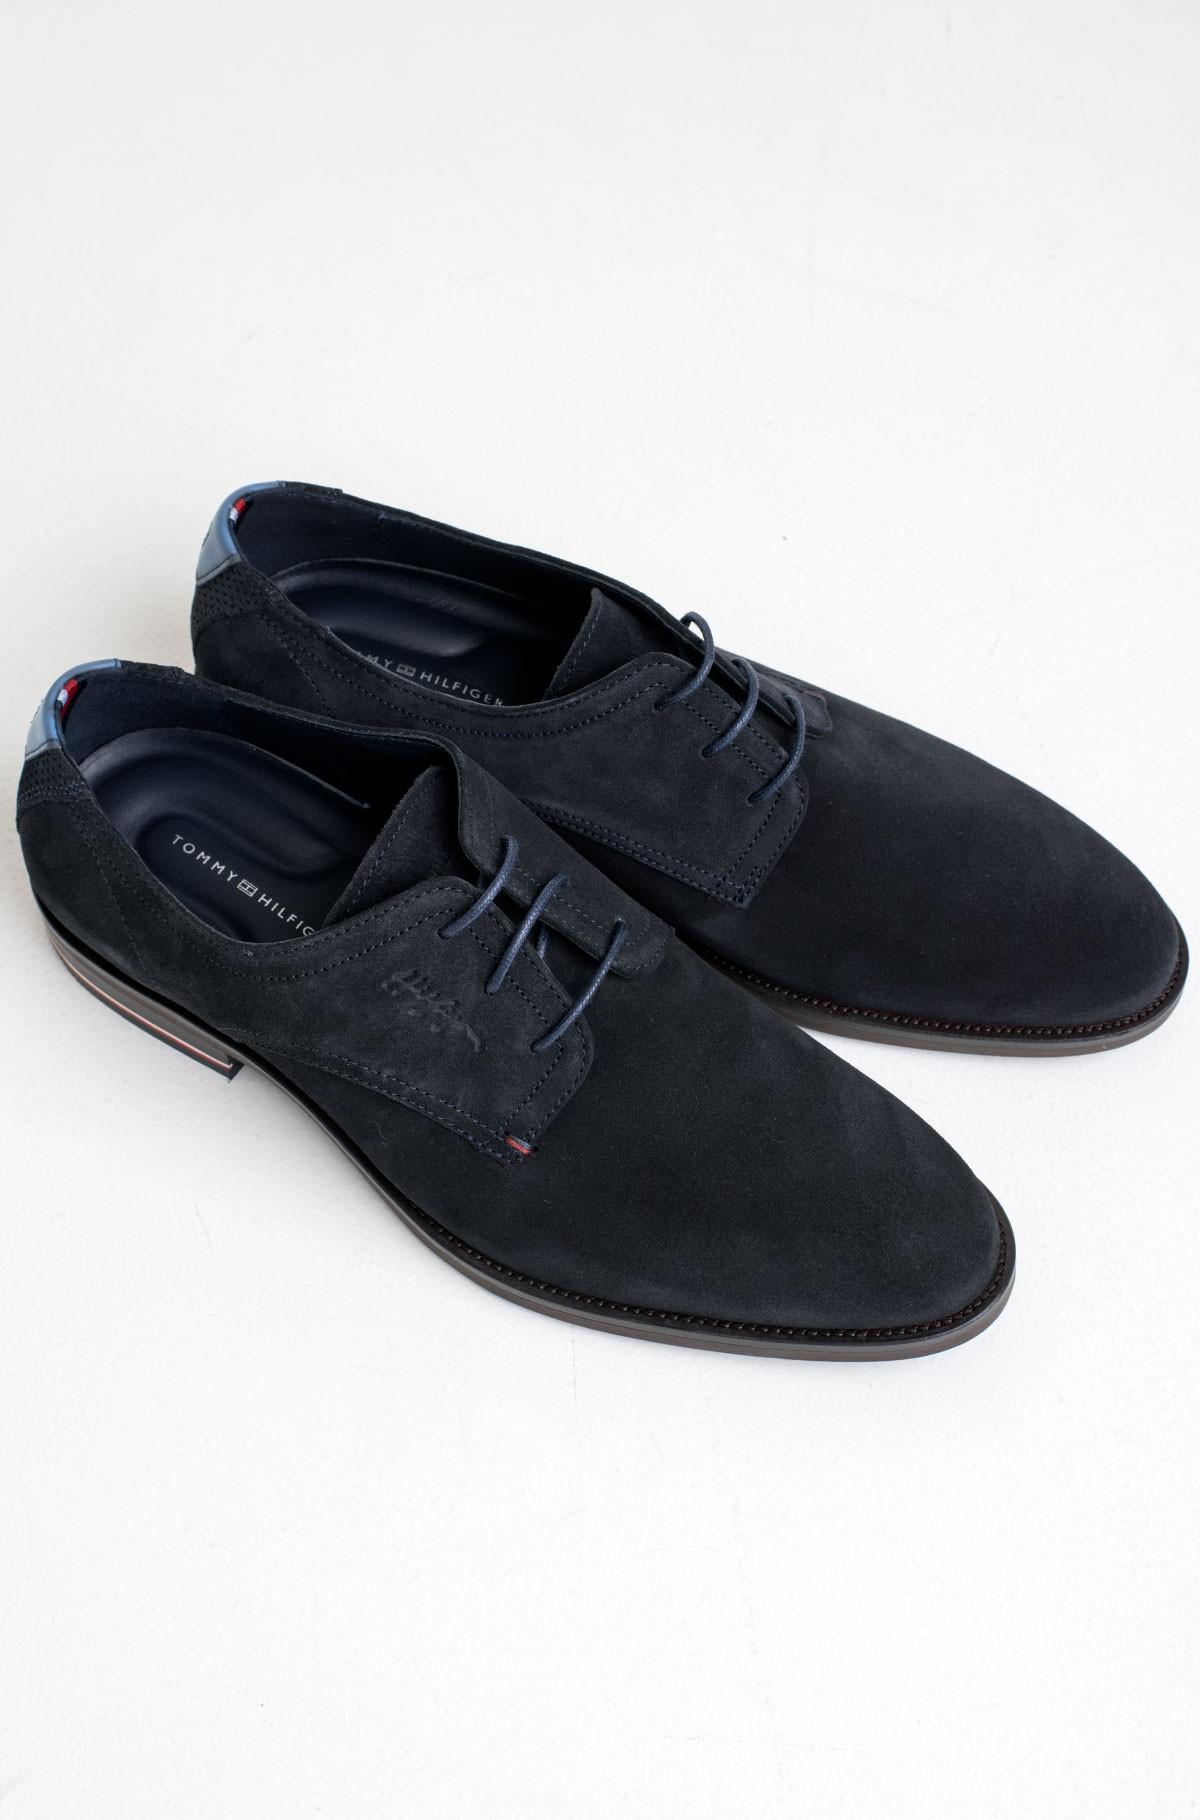 Shoes SIGNATURE HILFIGER SUEDE SHOE-full-1